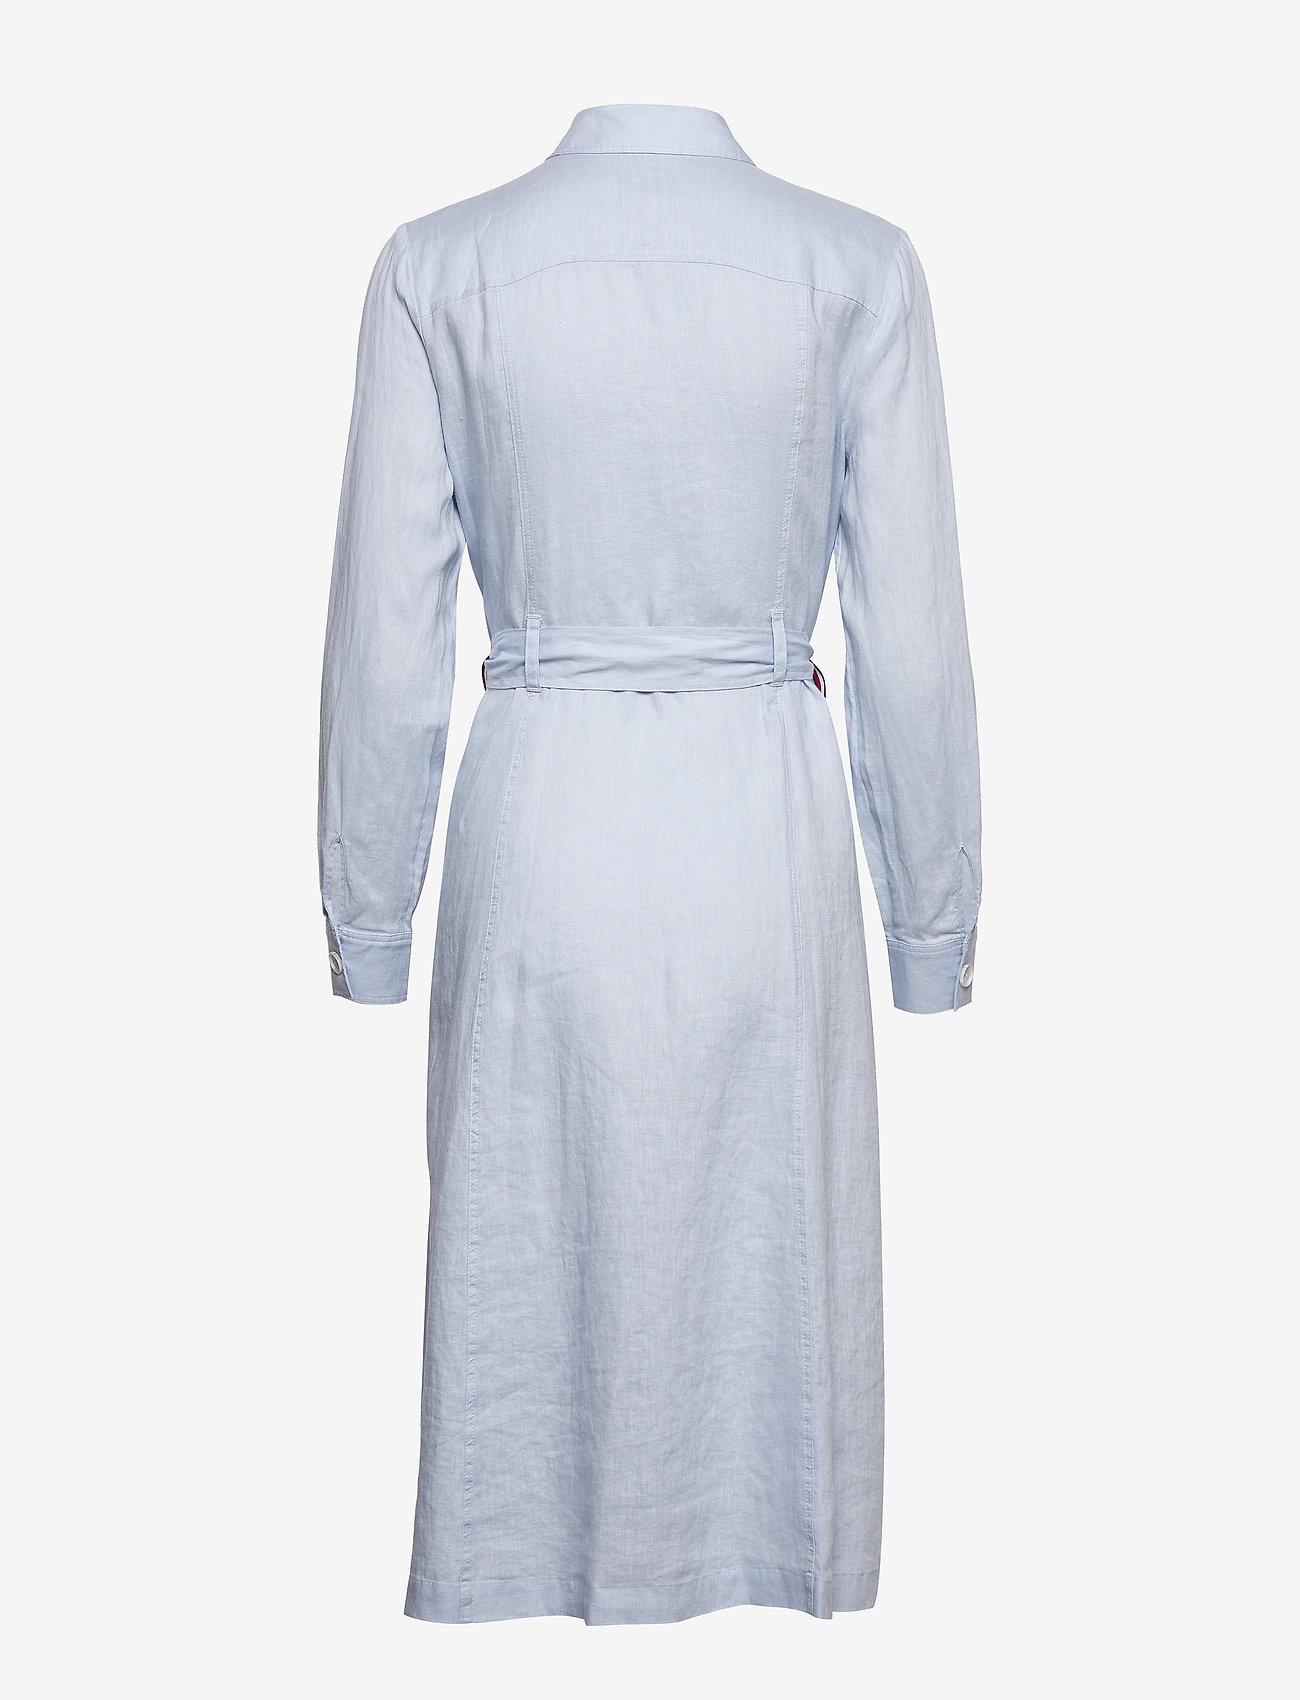 Tommy Hilfiger - TH ESSENTIAL PENELOPE DRESS LS - shirt dresses - breezy blue